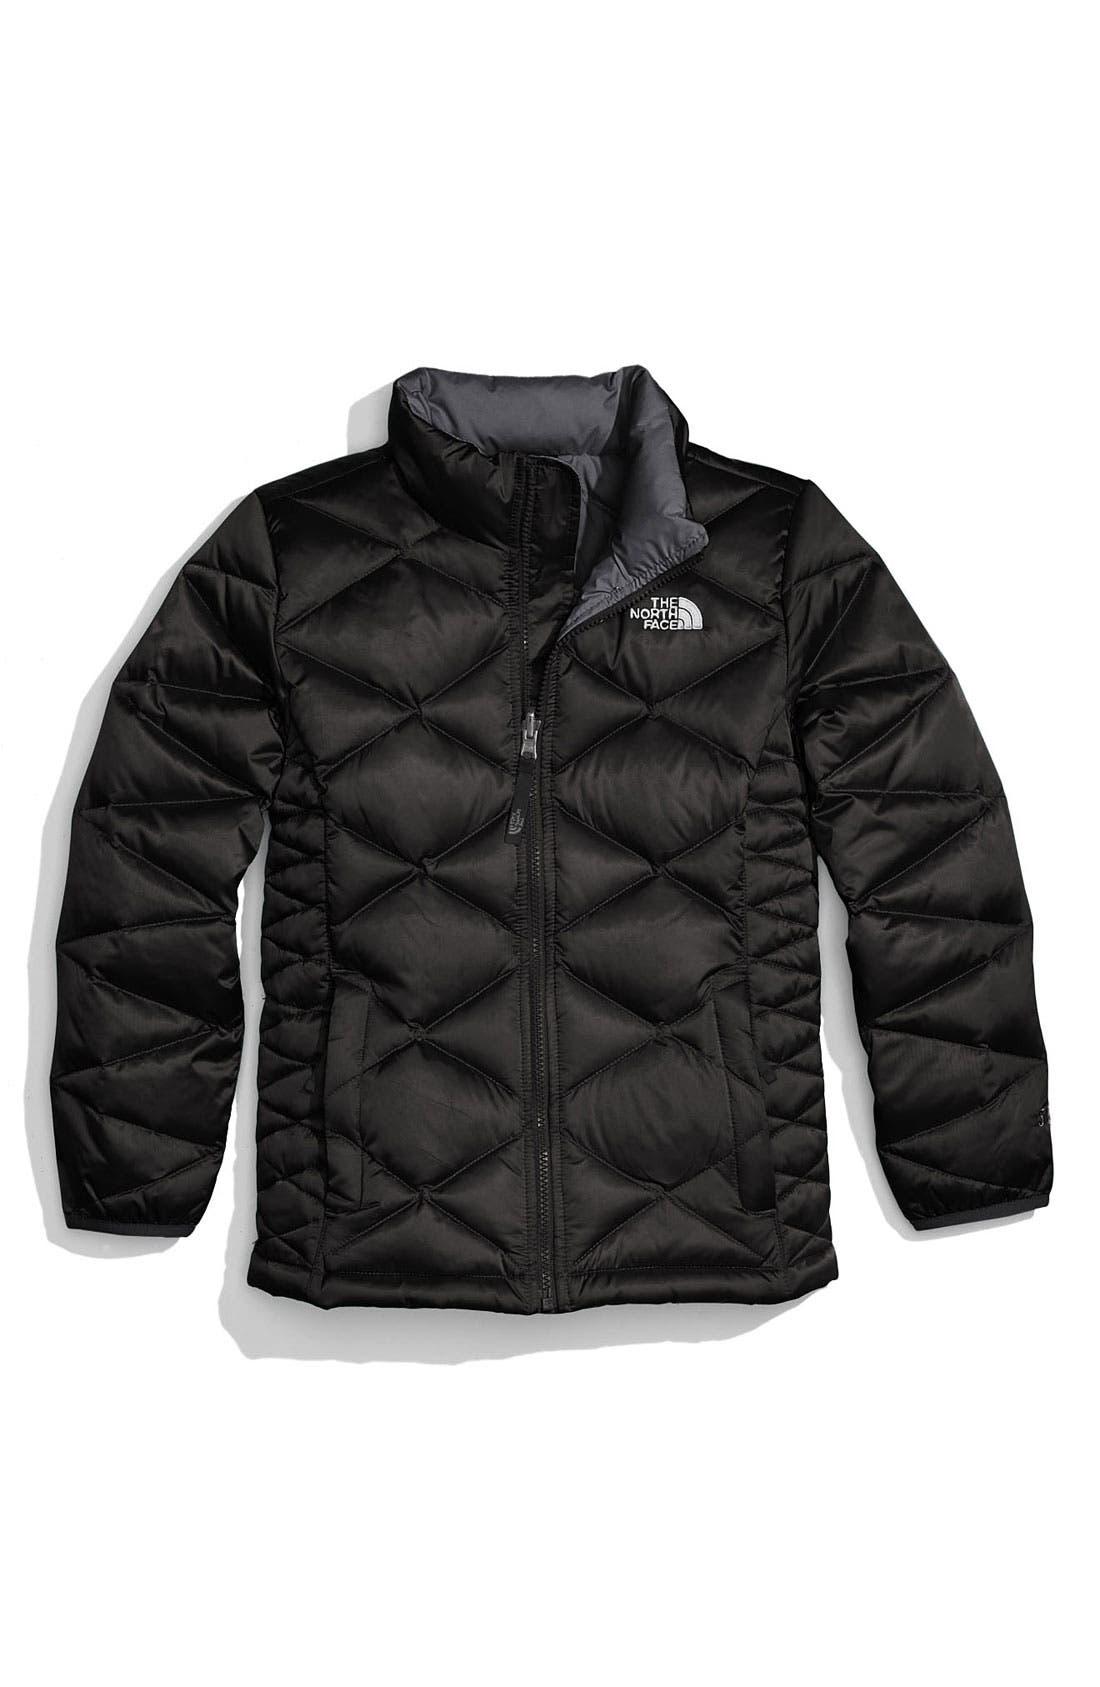 Alternate Image 1 Selected - The North Face 'Aconcagua' Jacket (Big Girls)